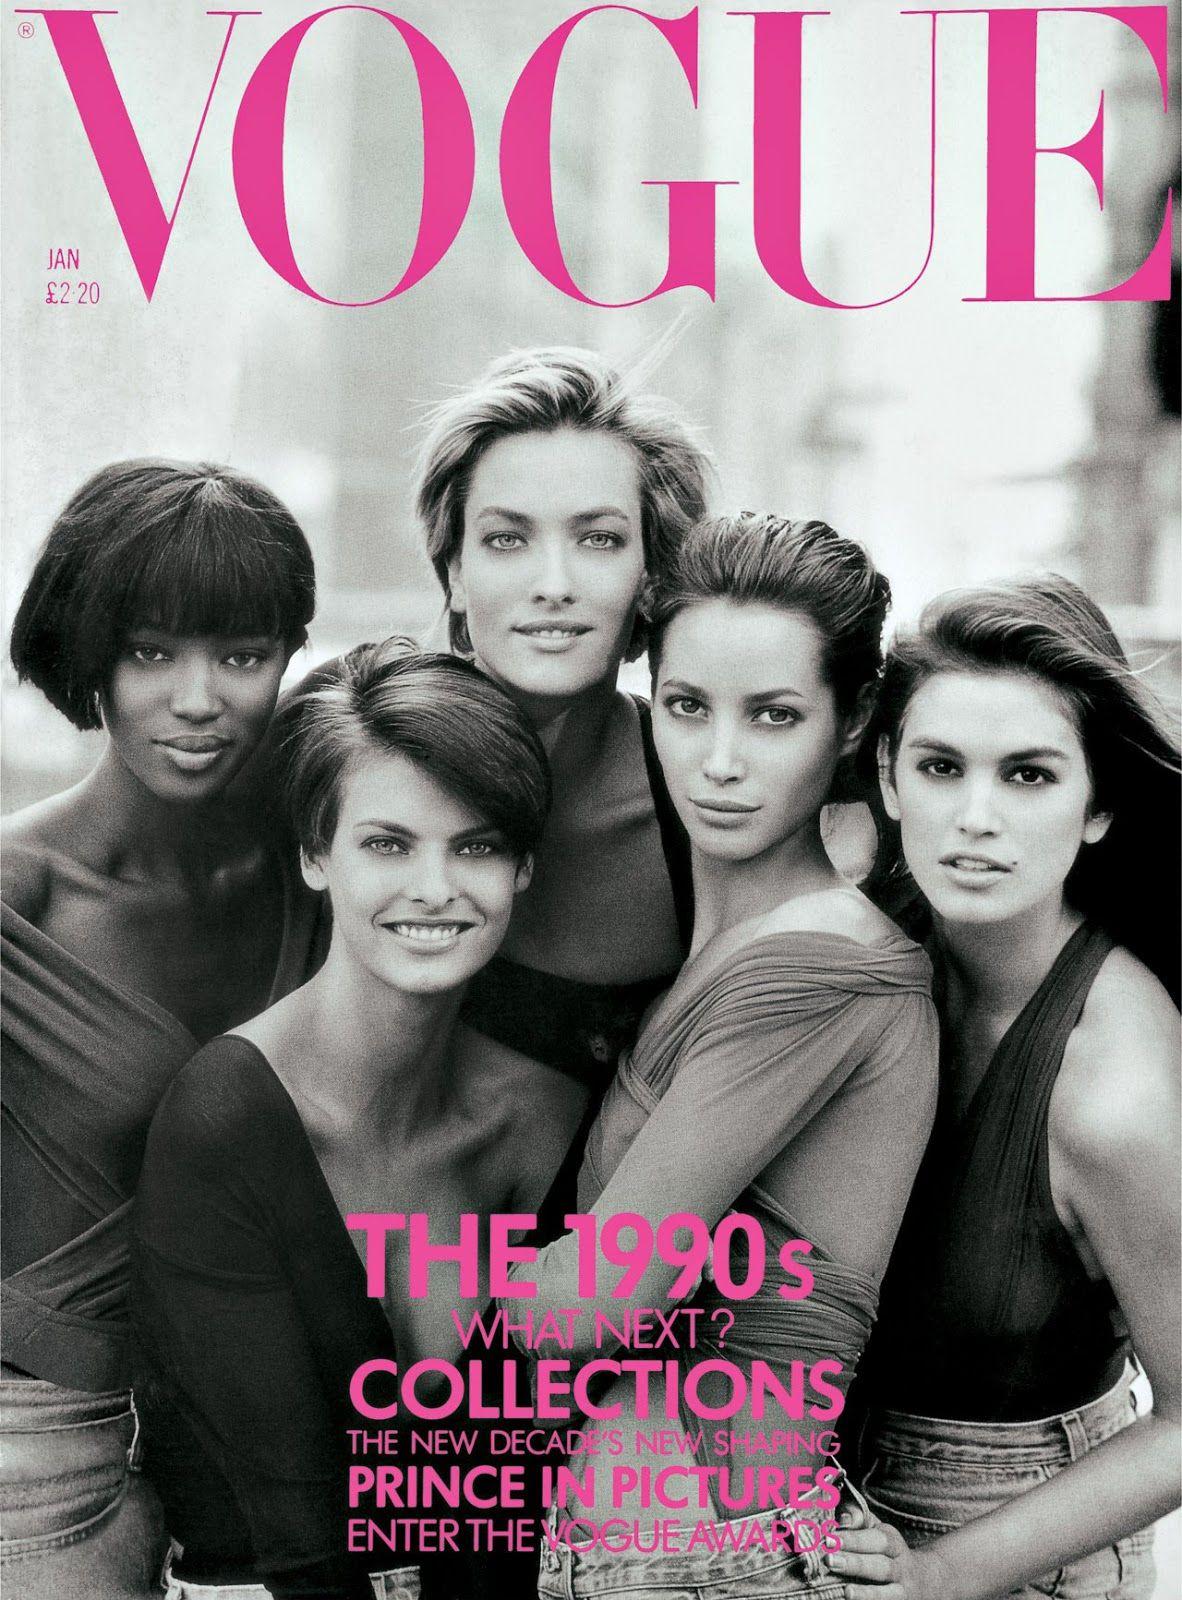 Naomi Campbell, Linda Evangelista, Tatjana Patitz, Christy Turlington and Cindy Crawford for Vogue UK January 1990